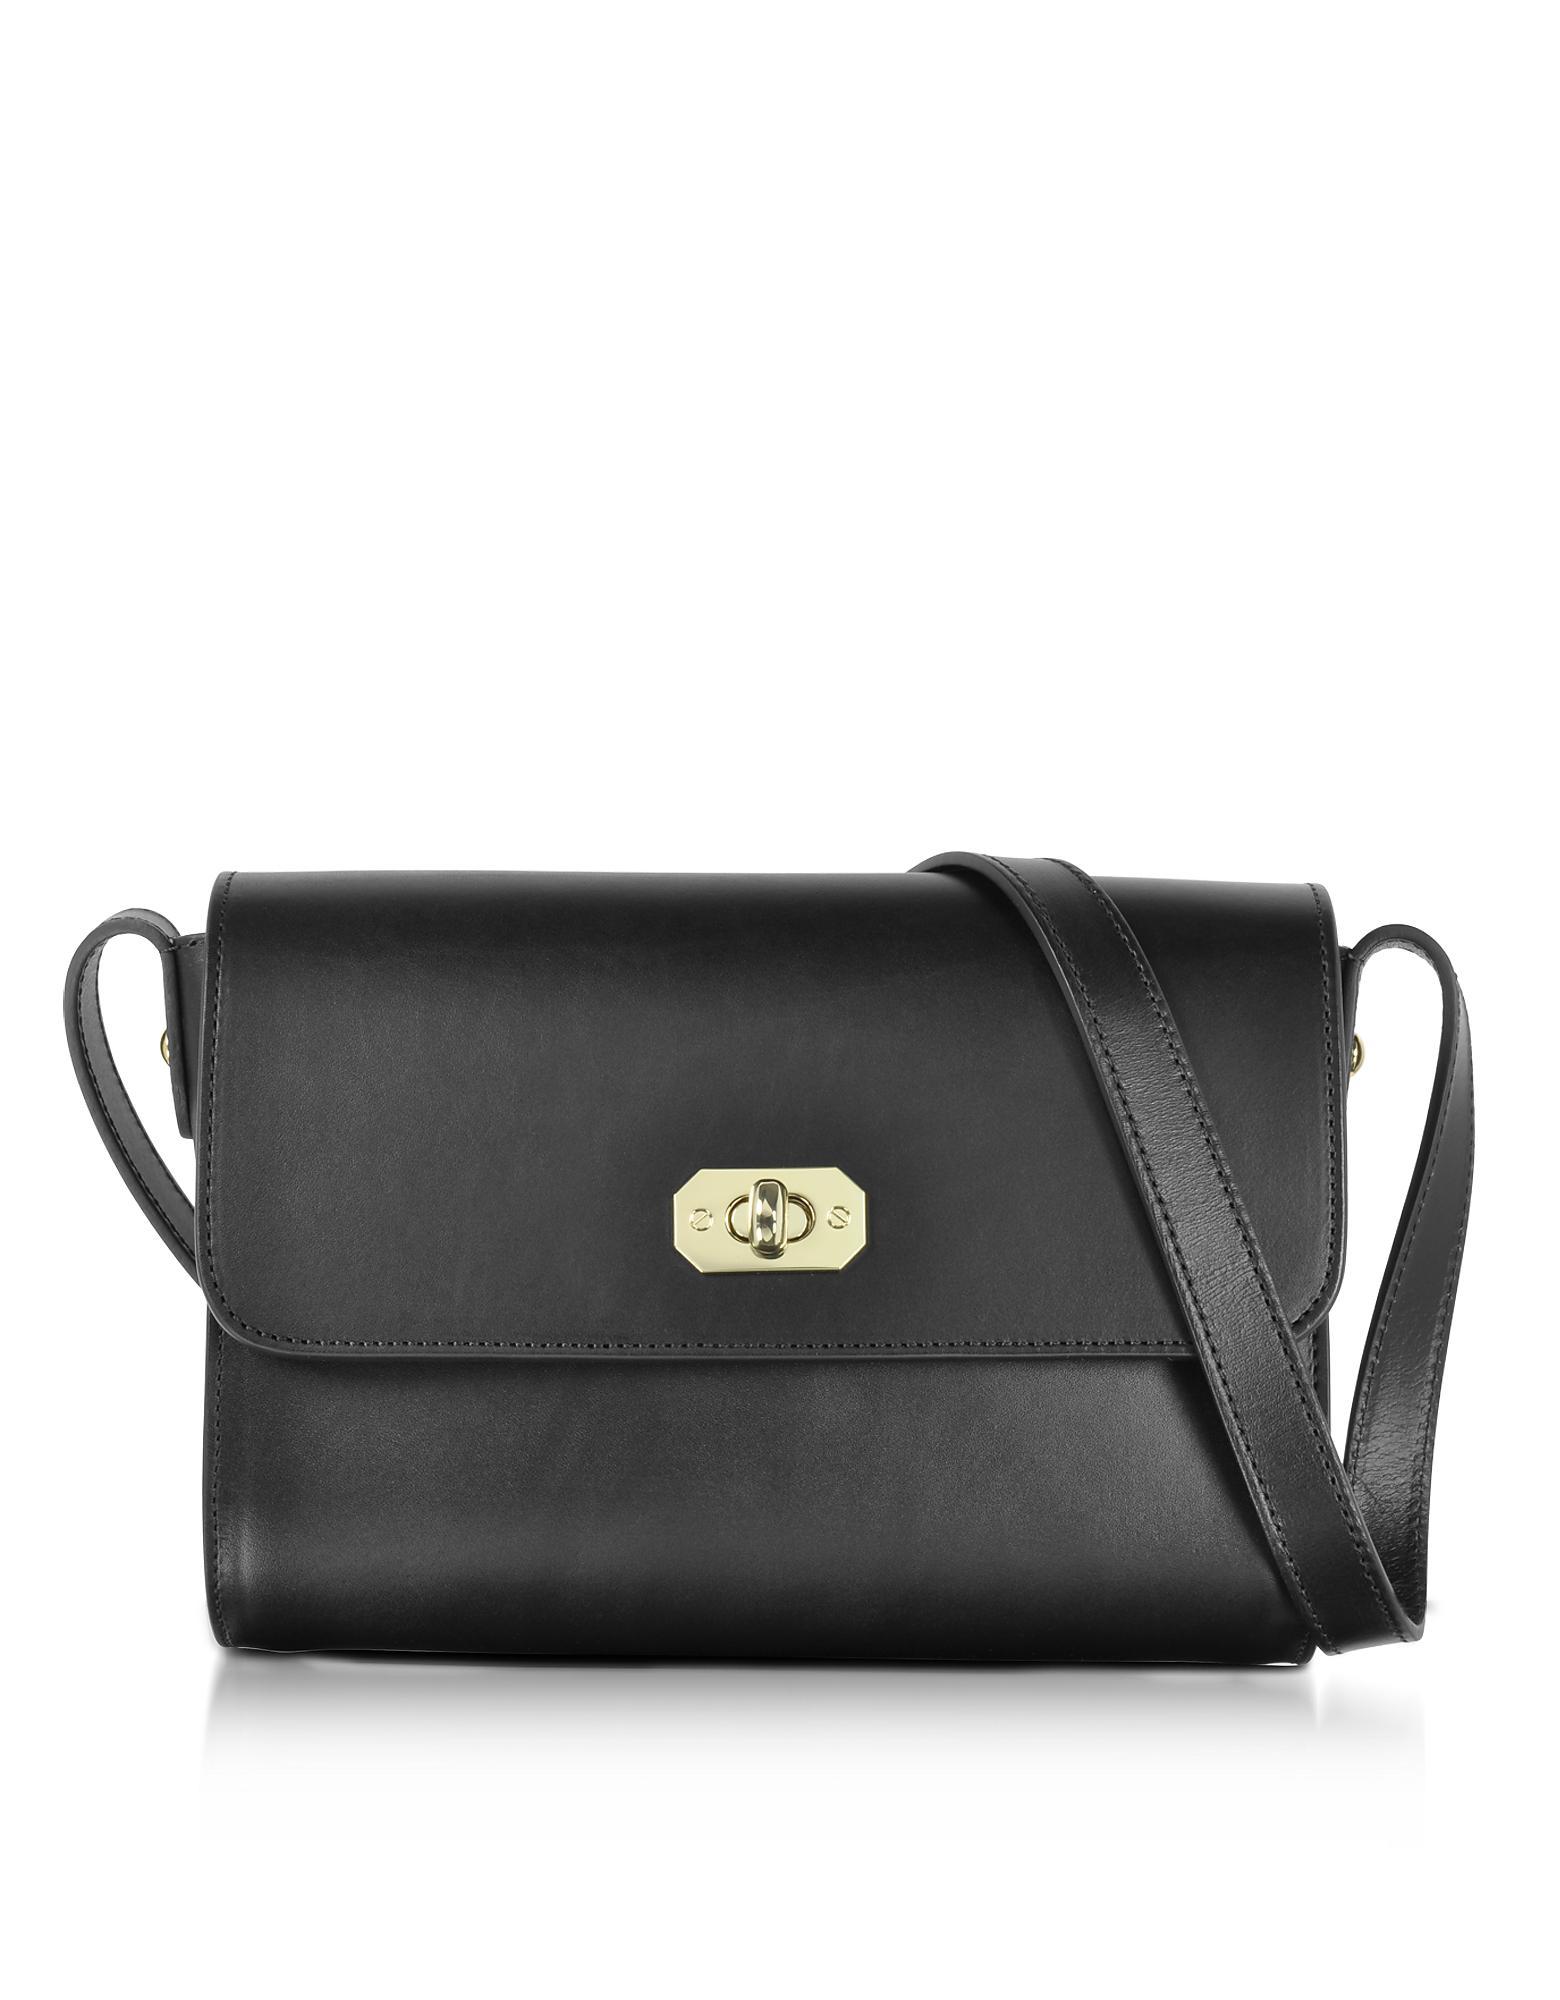 A.P.C. Greenwich Black Leather Crossbody Bag in Black - Lyst eeacaaa9cf